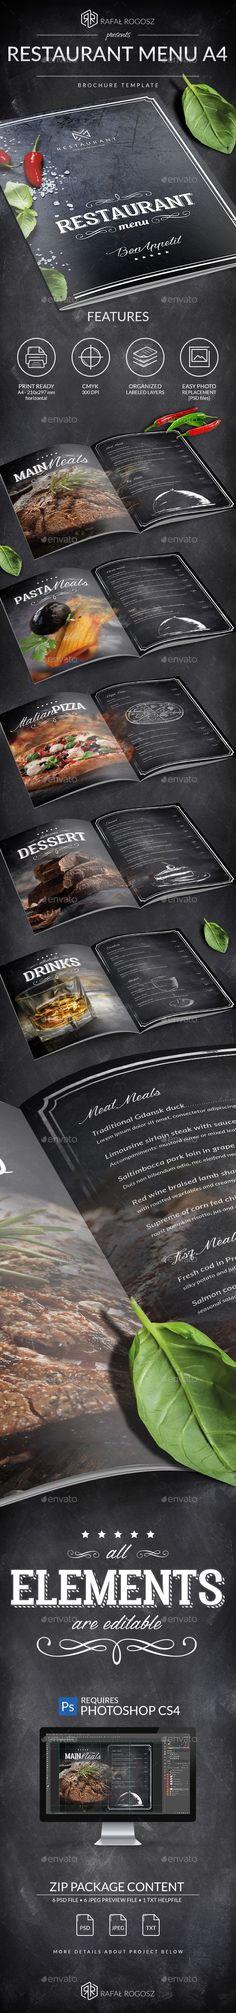 Blackboard Luxury Restaurant Menu A4 — Photoshop PSD #black #table tent • Download ➝ https://graphicriver.net/item/blackboard-luxury-restaurant-menu-a4/19681100?ref=pxcr